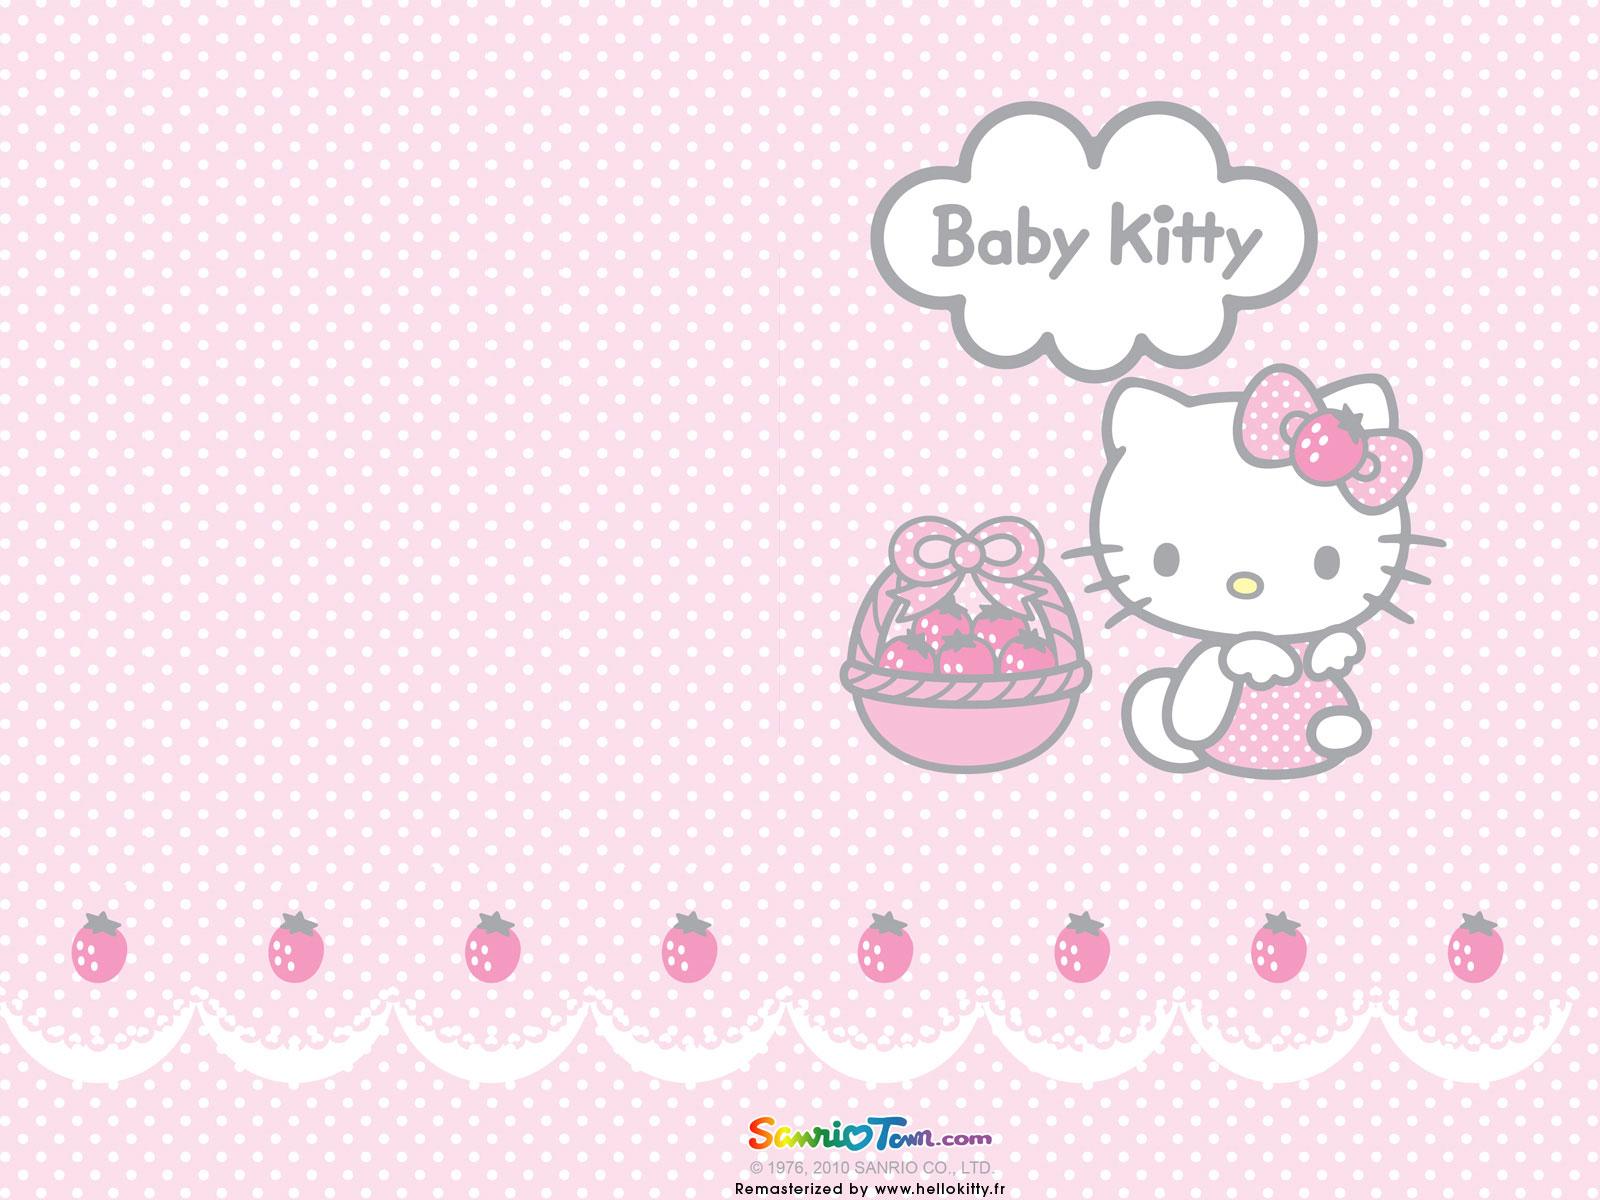 http://1.bp.blogspot.com/-NJmGbIkwqJQ/UHThcrLoayI/AAAAAAAAISg/fDinQaixESw/s1600/Hello-Kitty-Wallpaper-9.jpg